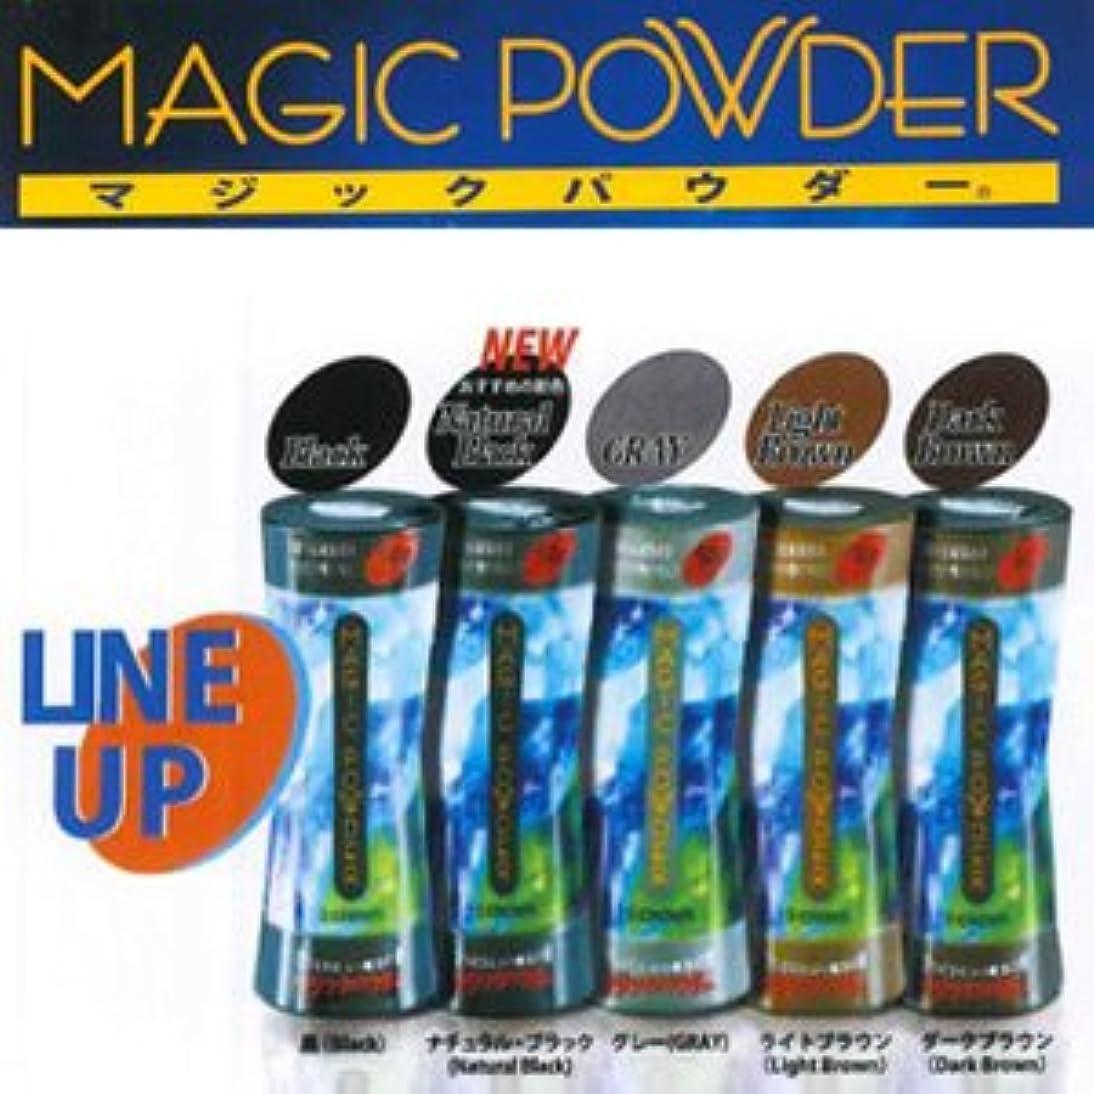 MAGIC POWDER マジックパウダー グレー 50g  ※貴方の髪を簡単ボリュームアップ!